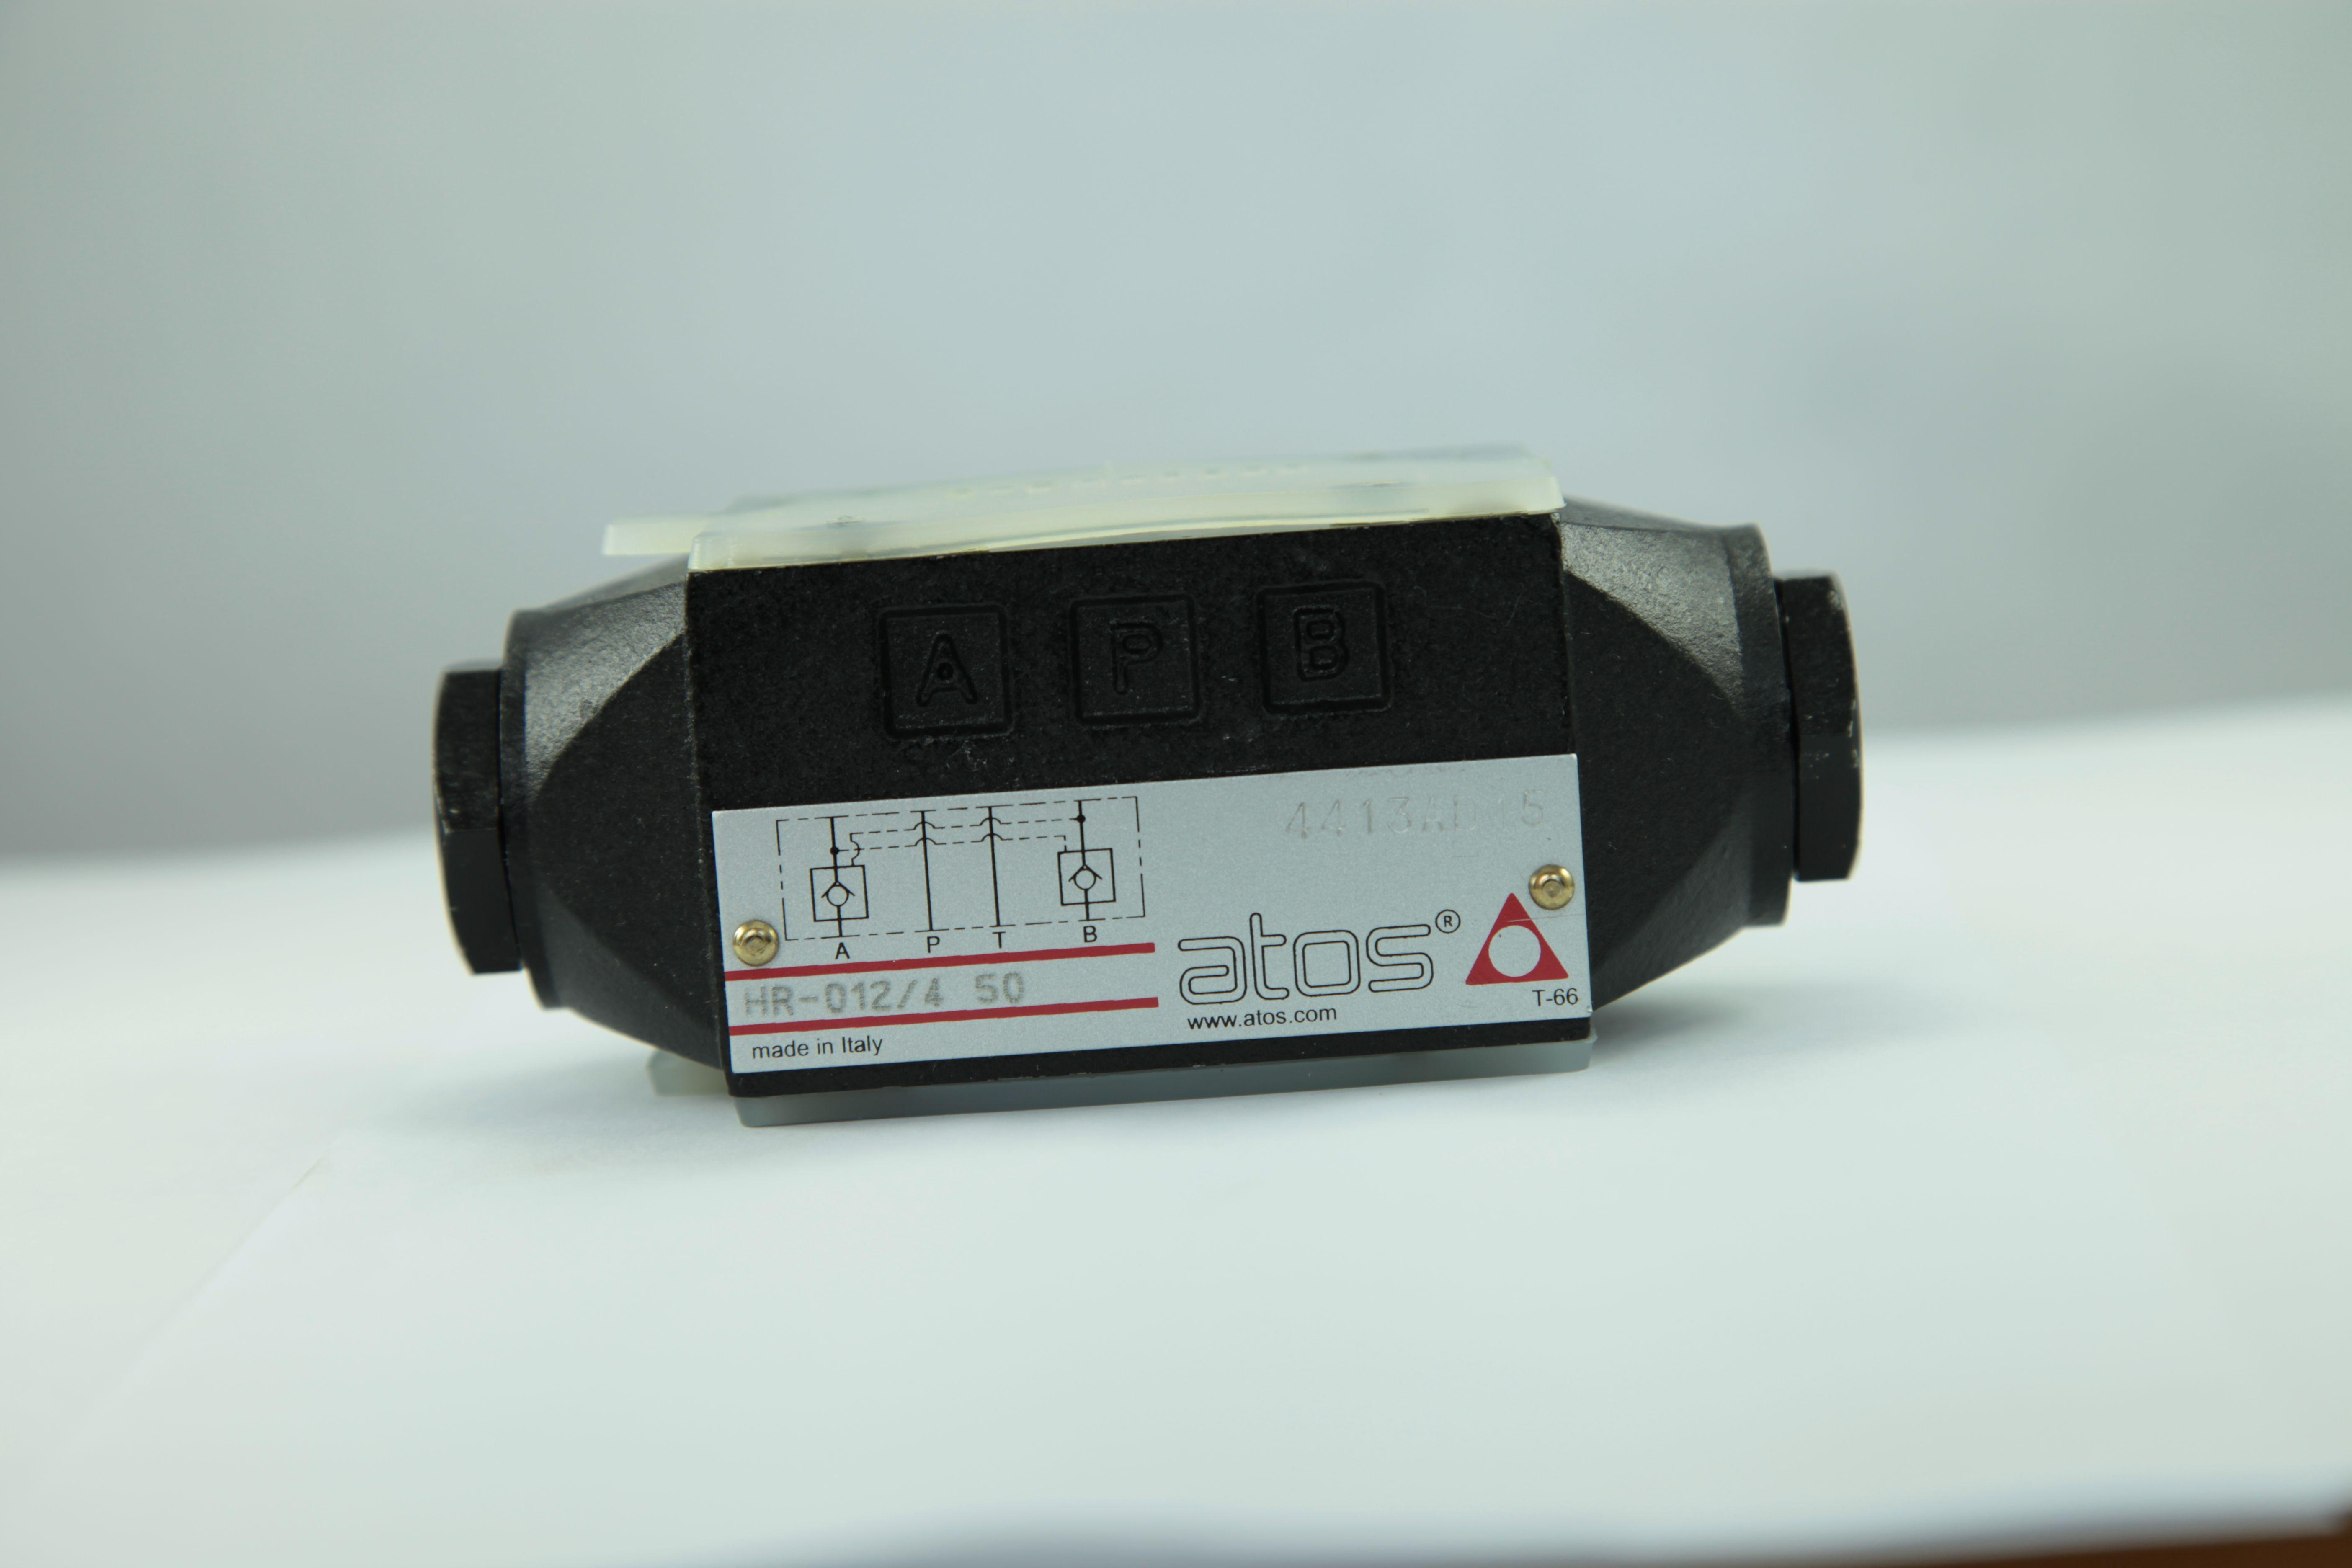 /bt阿托斯液压阀原装进口图片